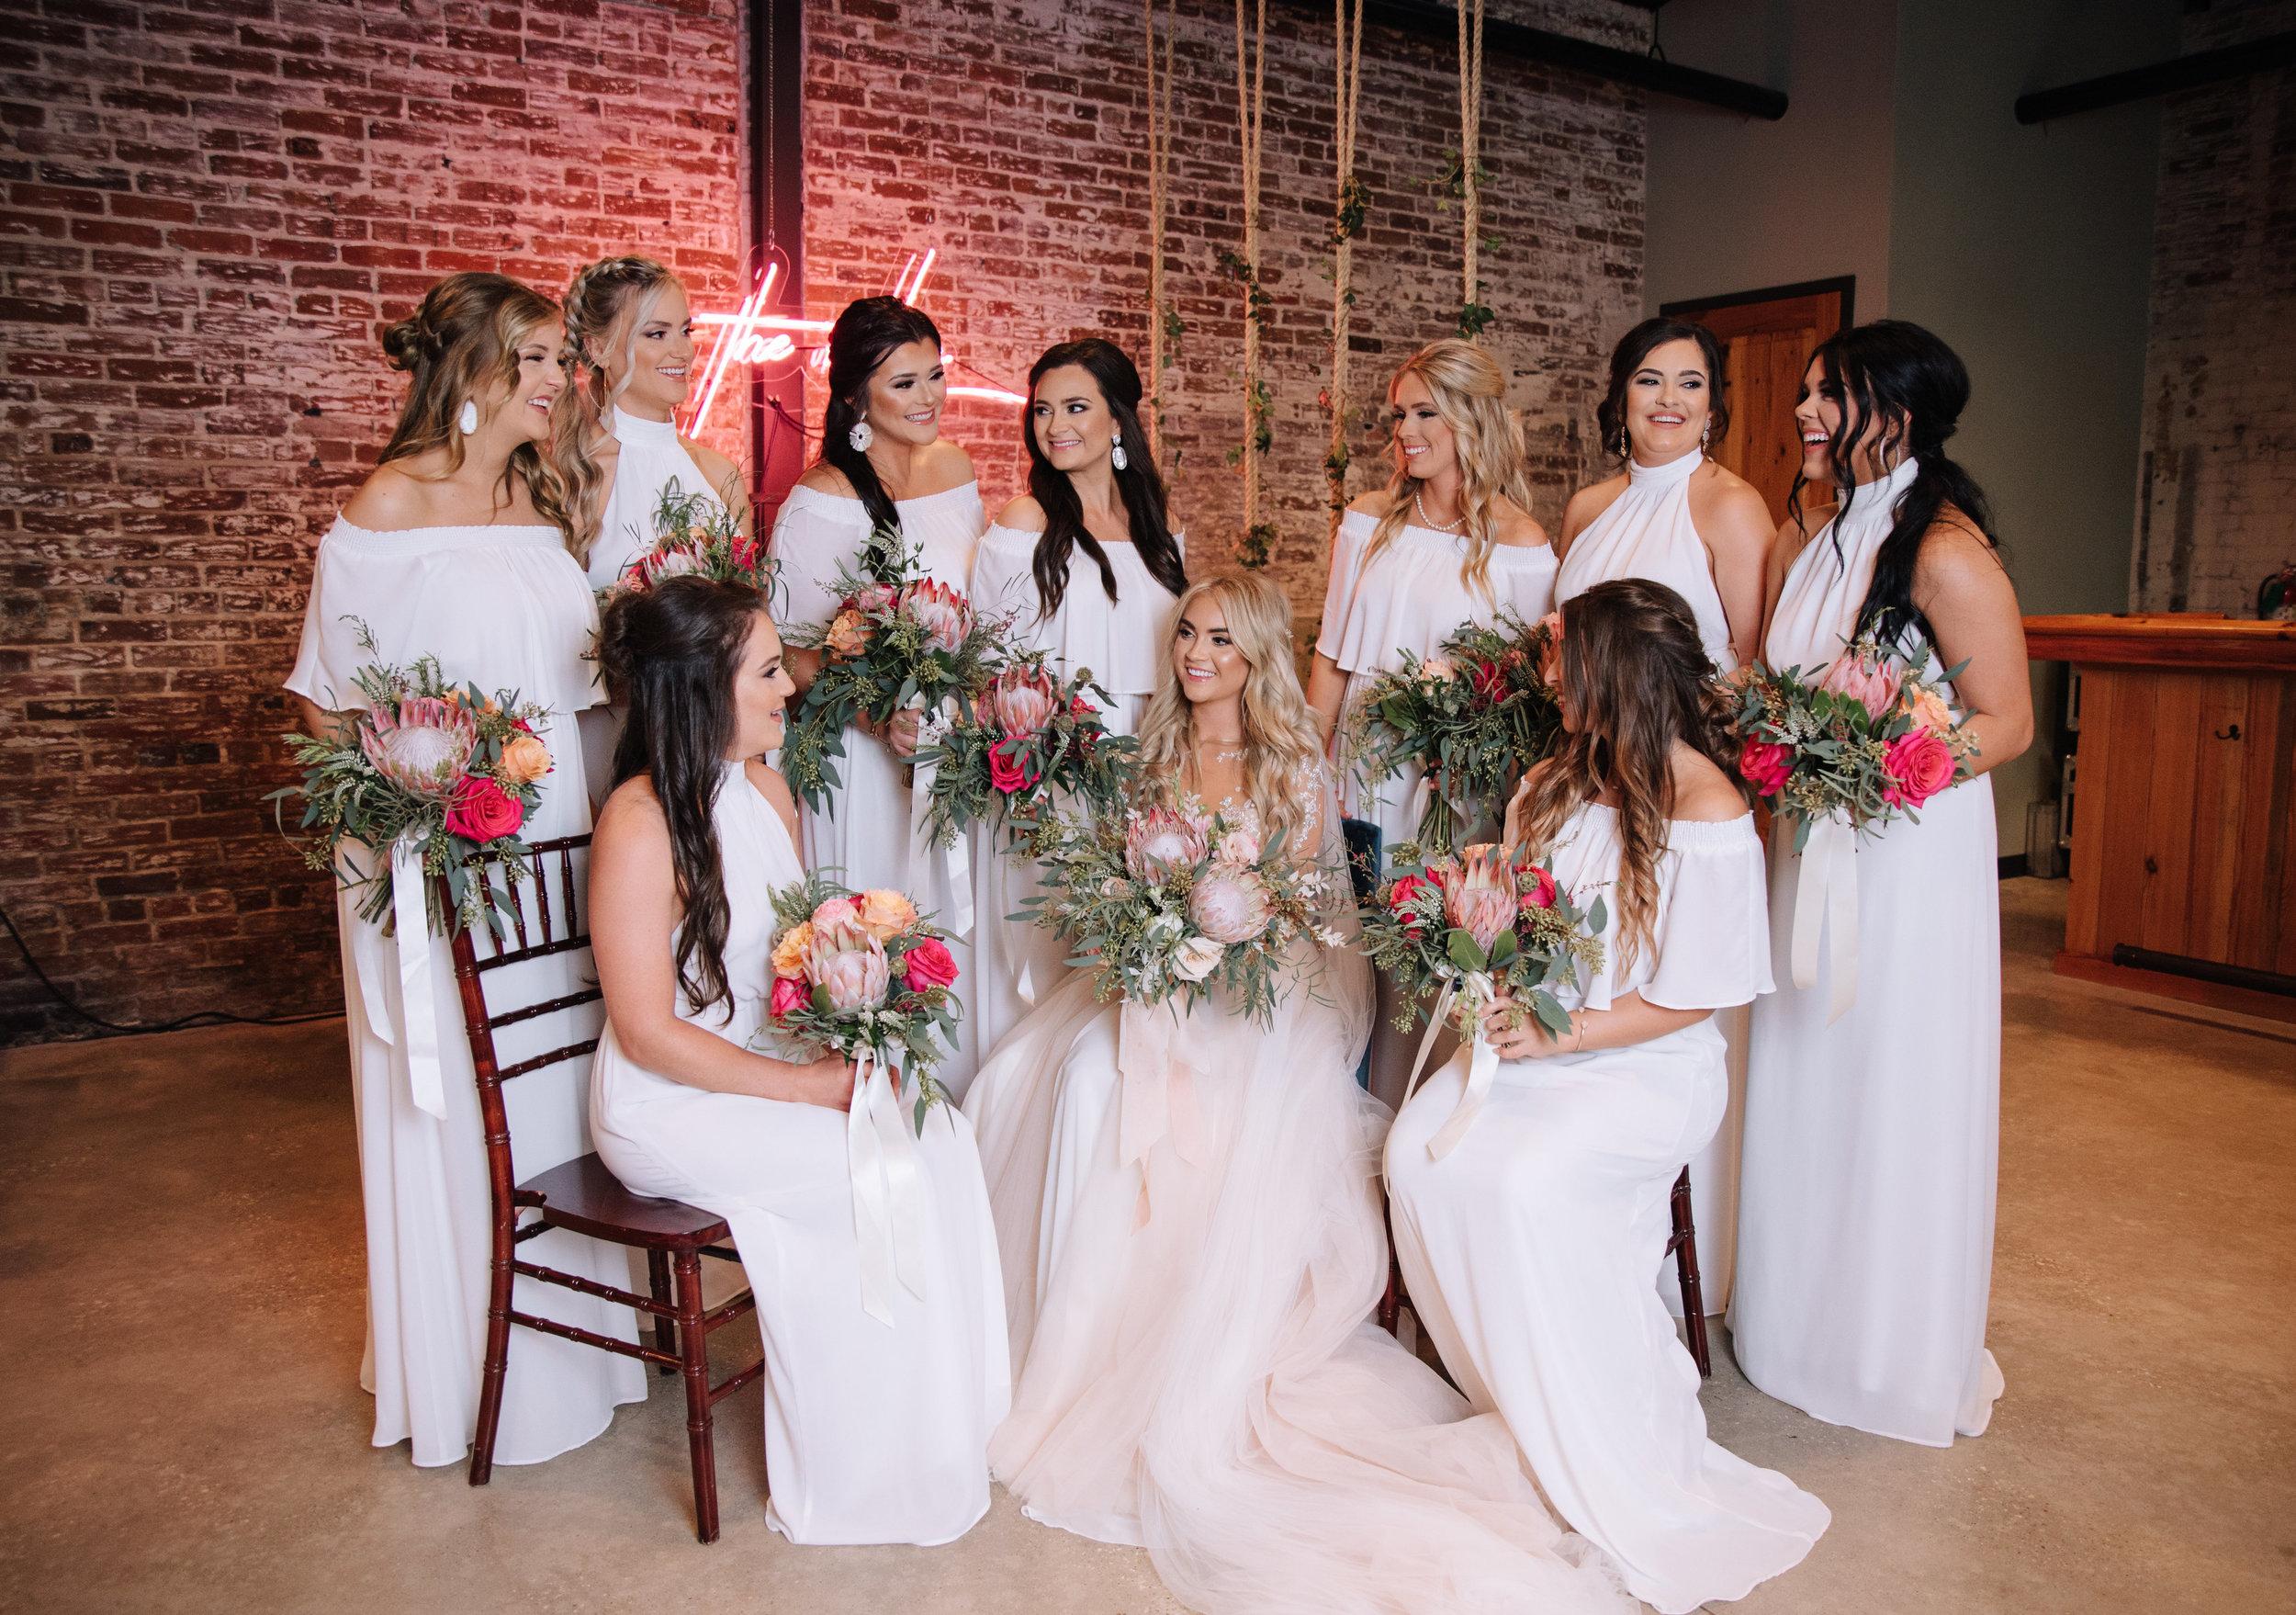 Neely Wedding Day-Neely Wedding Day-0164.jpg